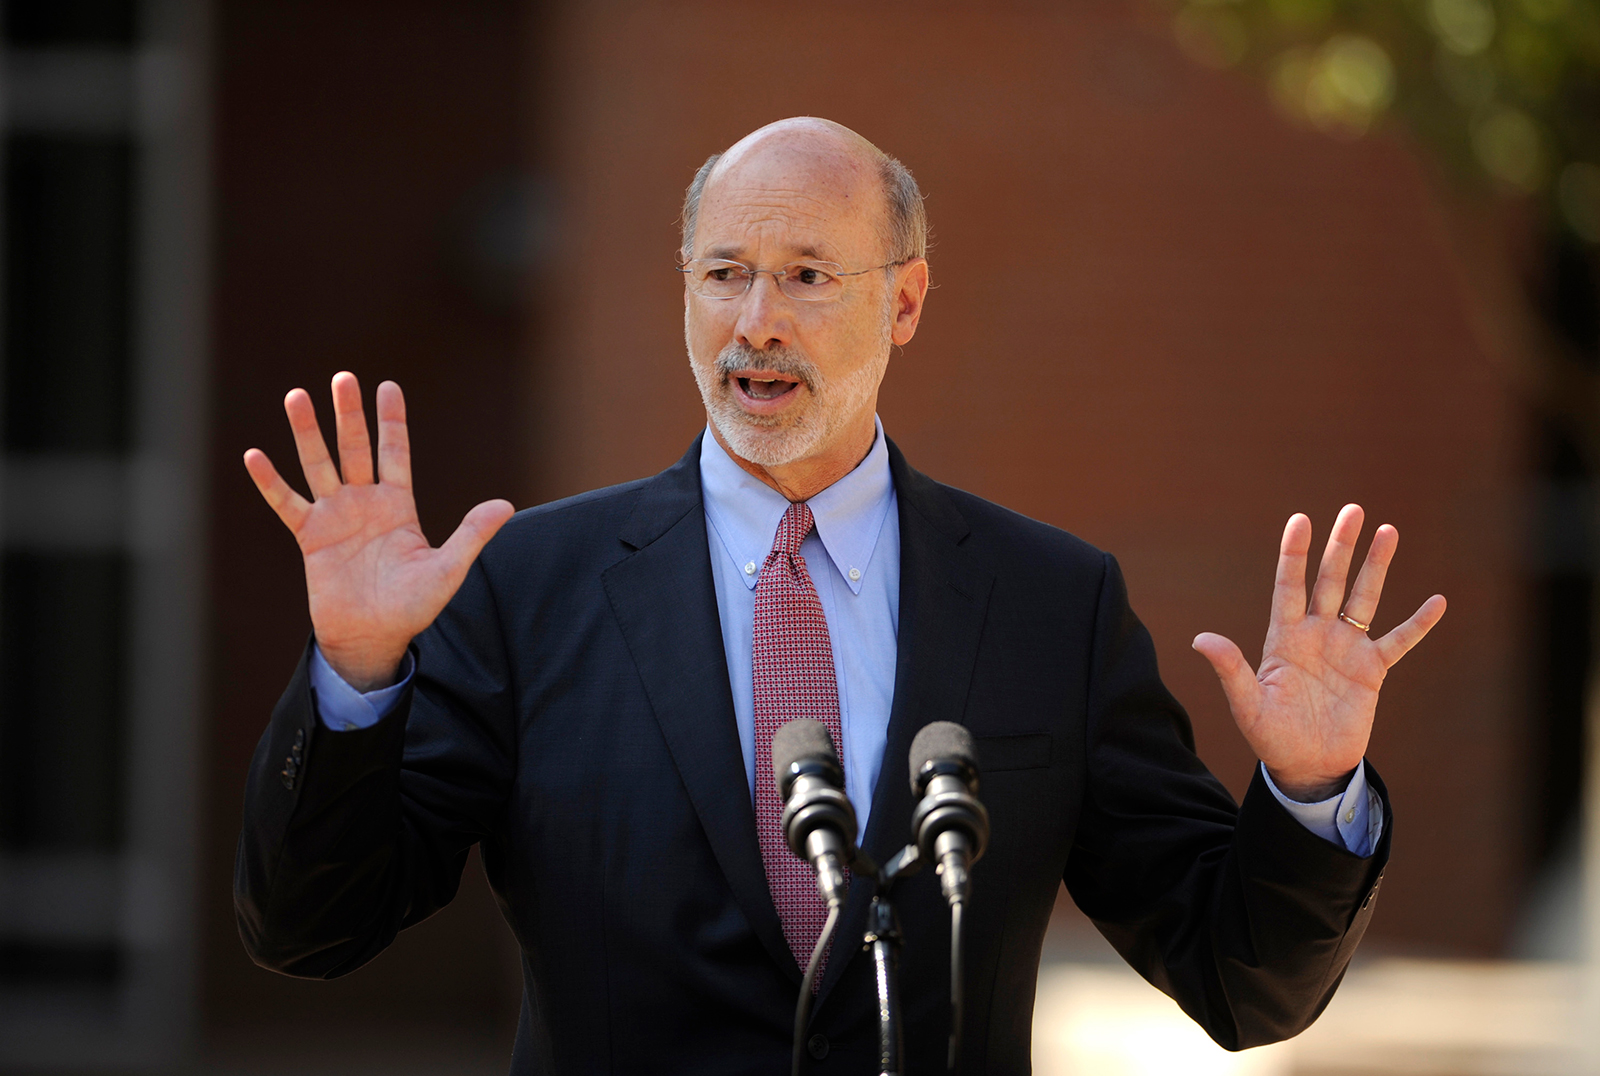 Gov. Tom Wolf speaks at Bellefonte Area High School on July 13, 2015 in Bellefonte, Pennsylvania.